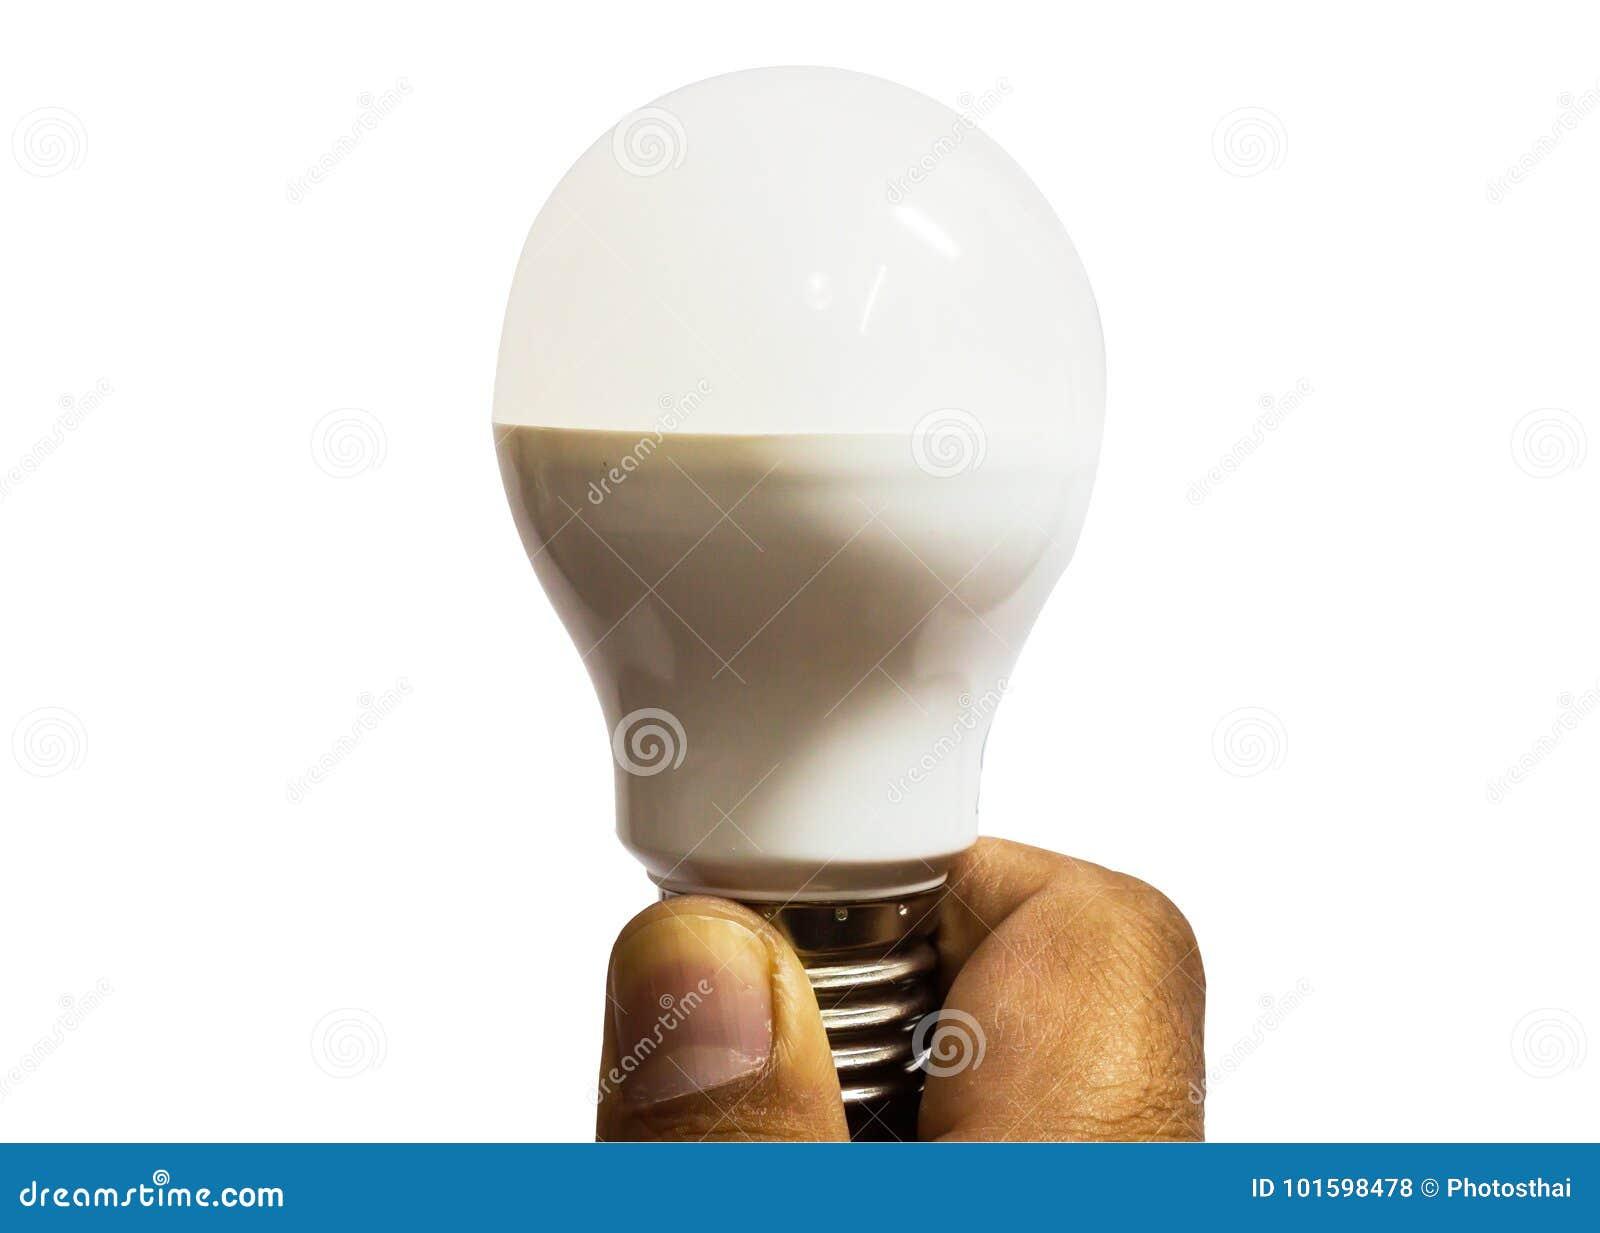 Fluorescent tube in man hand